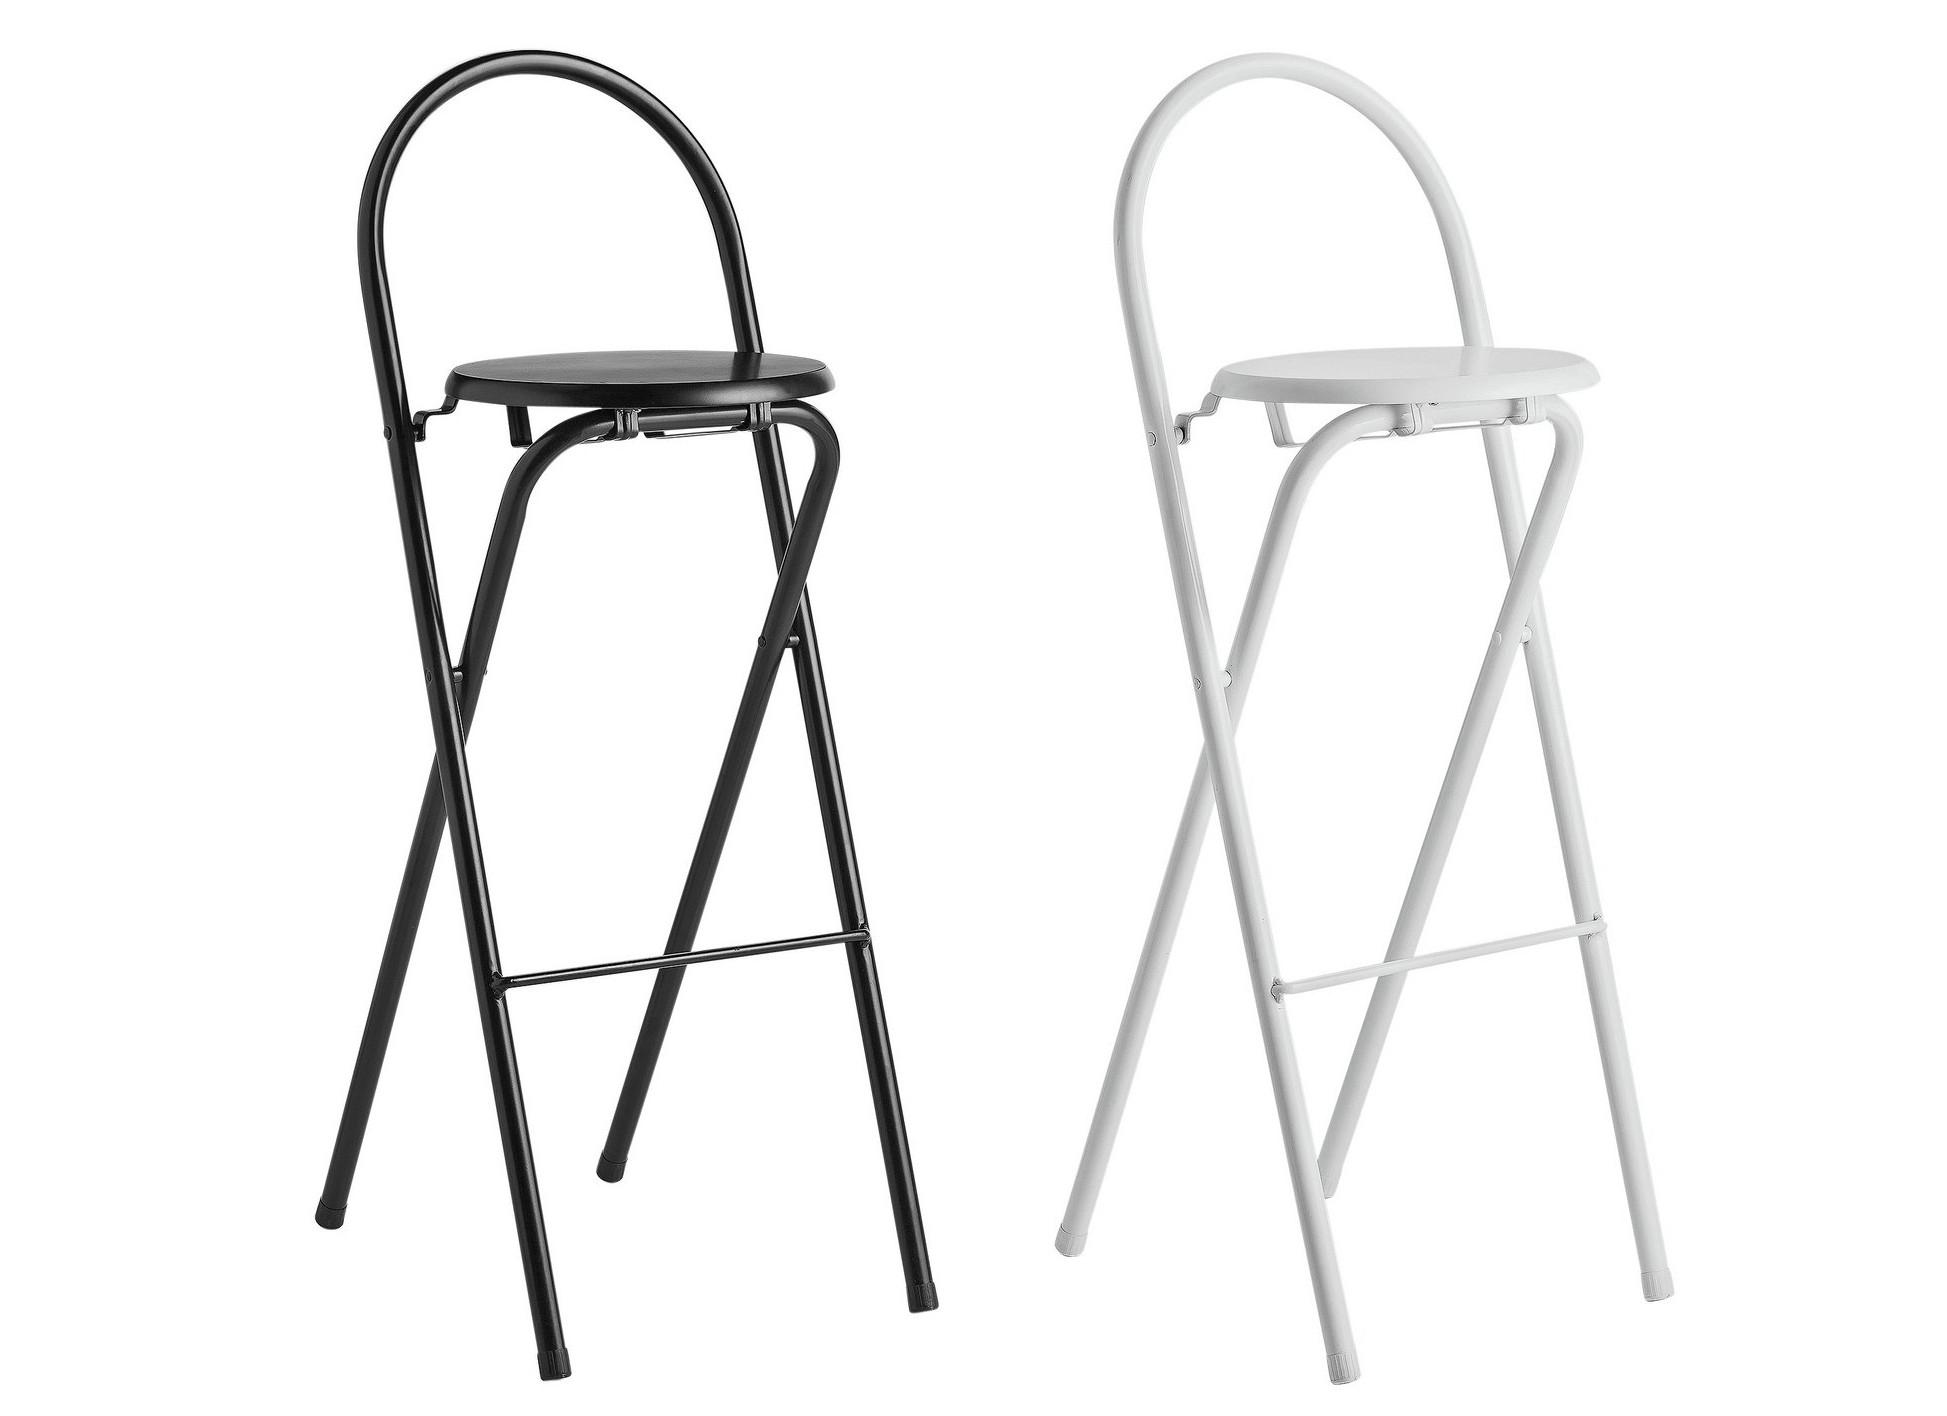 Habitat Macadam Metal Folding Bar Stools Black Or White For 163 10 49 Argos Hotukdeals